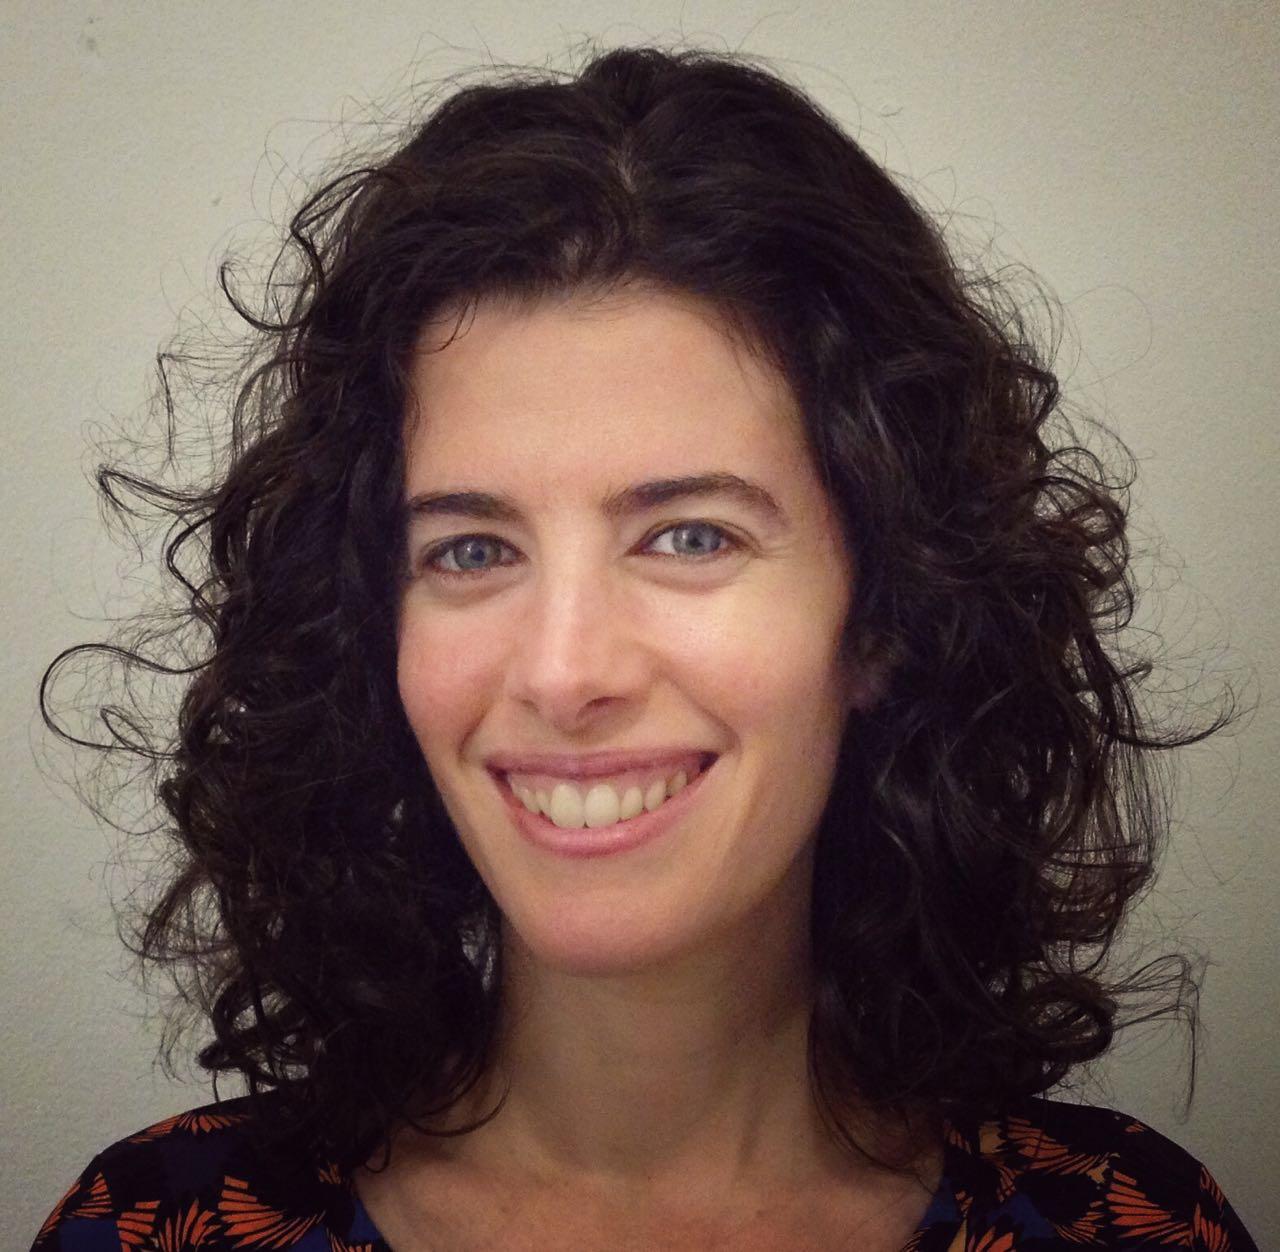 Ilana Gorban